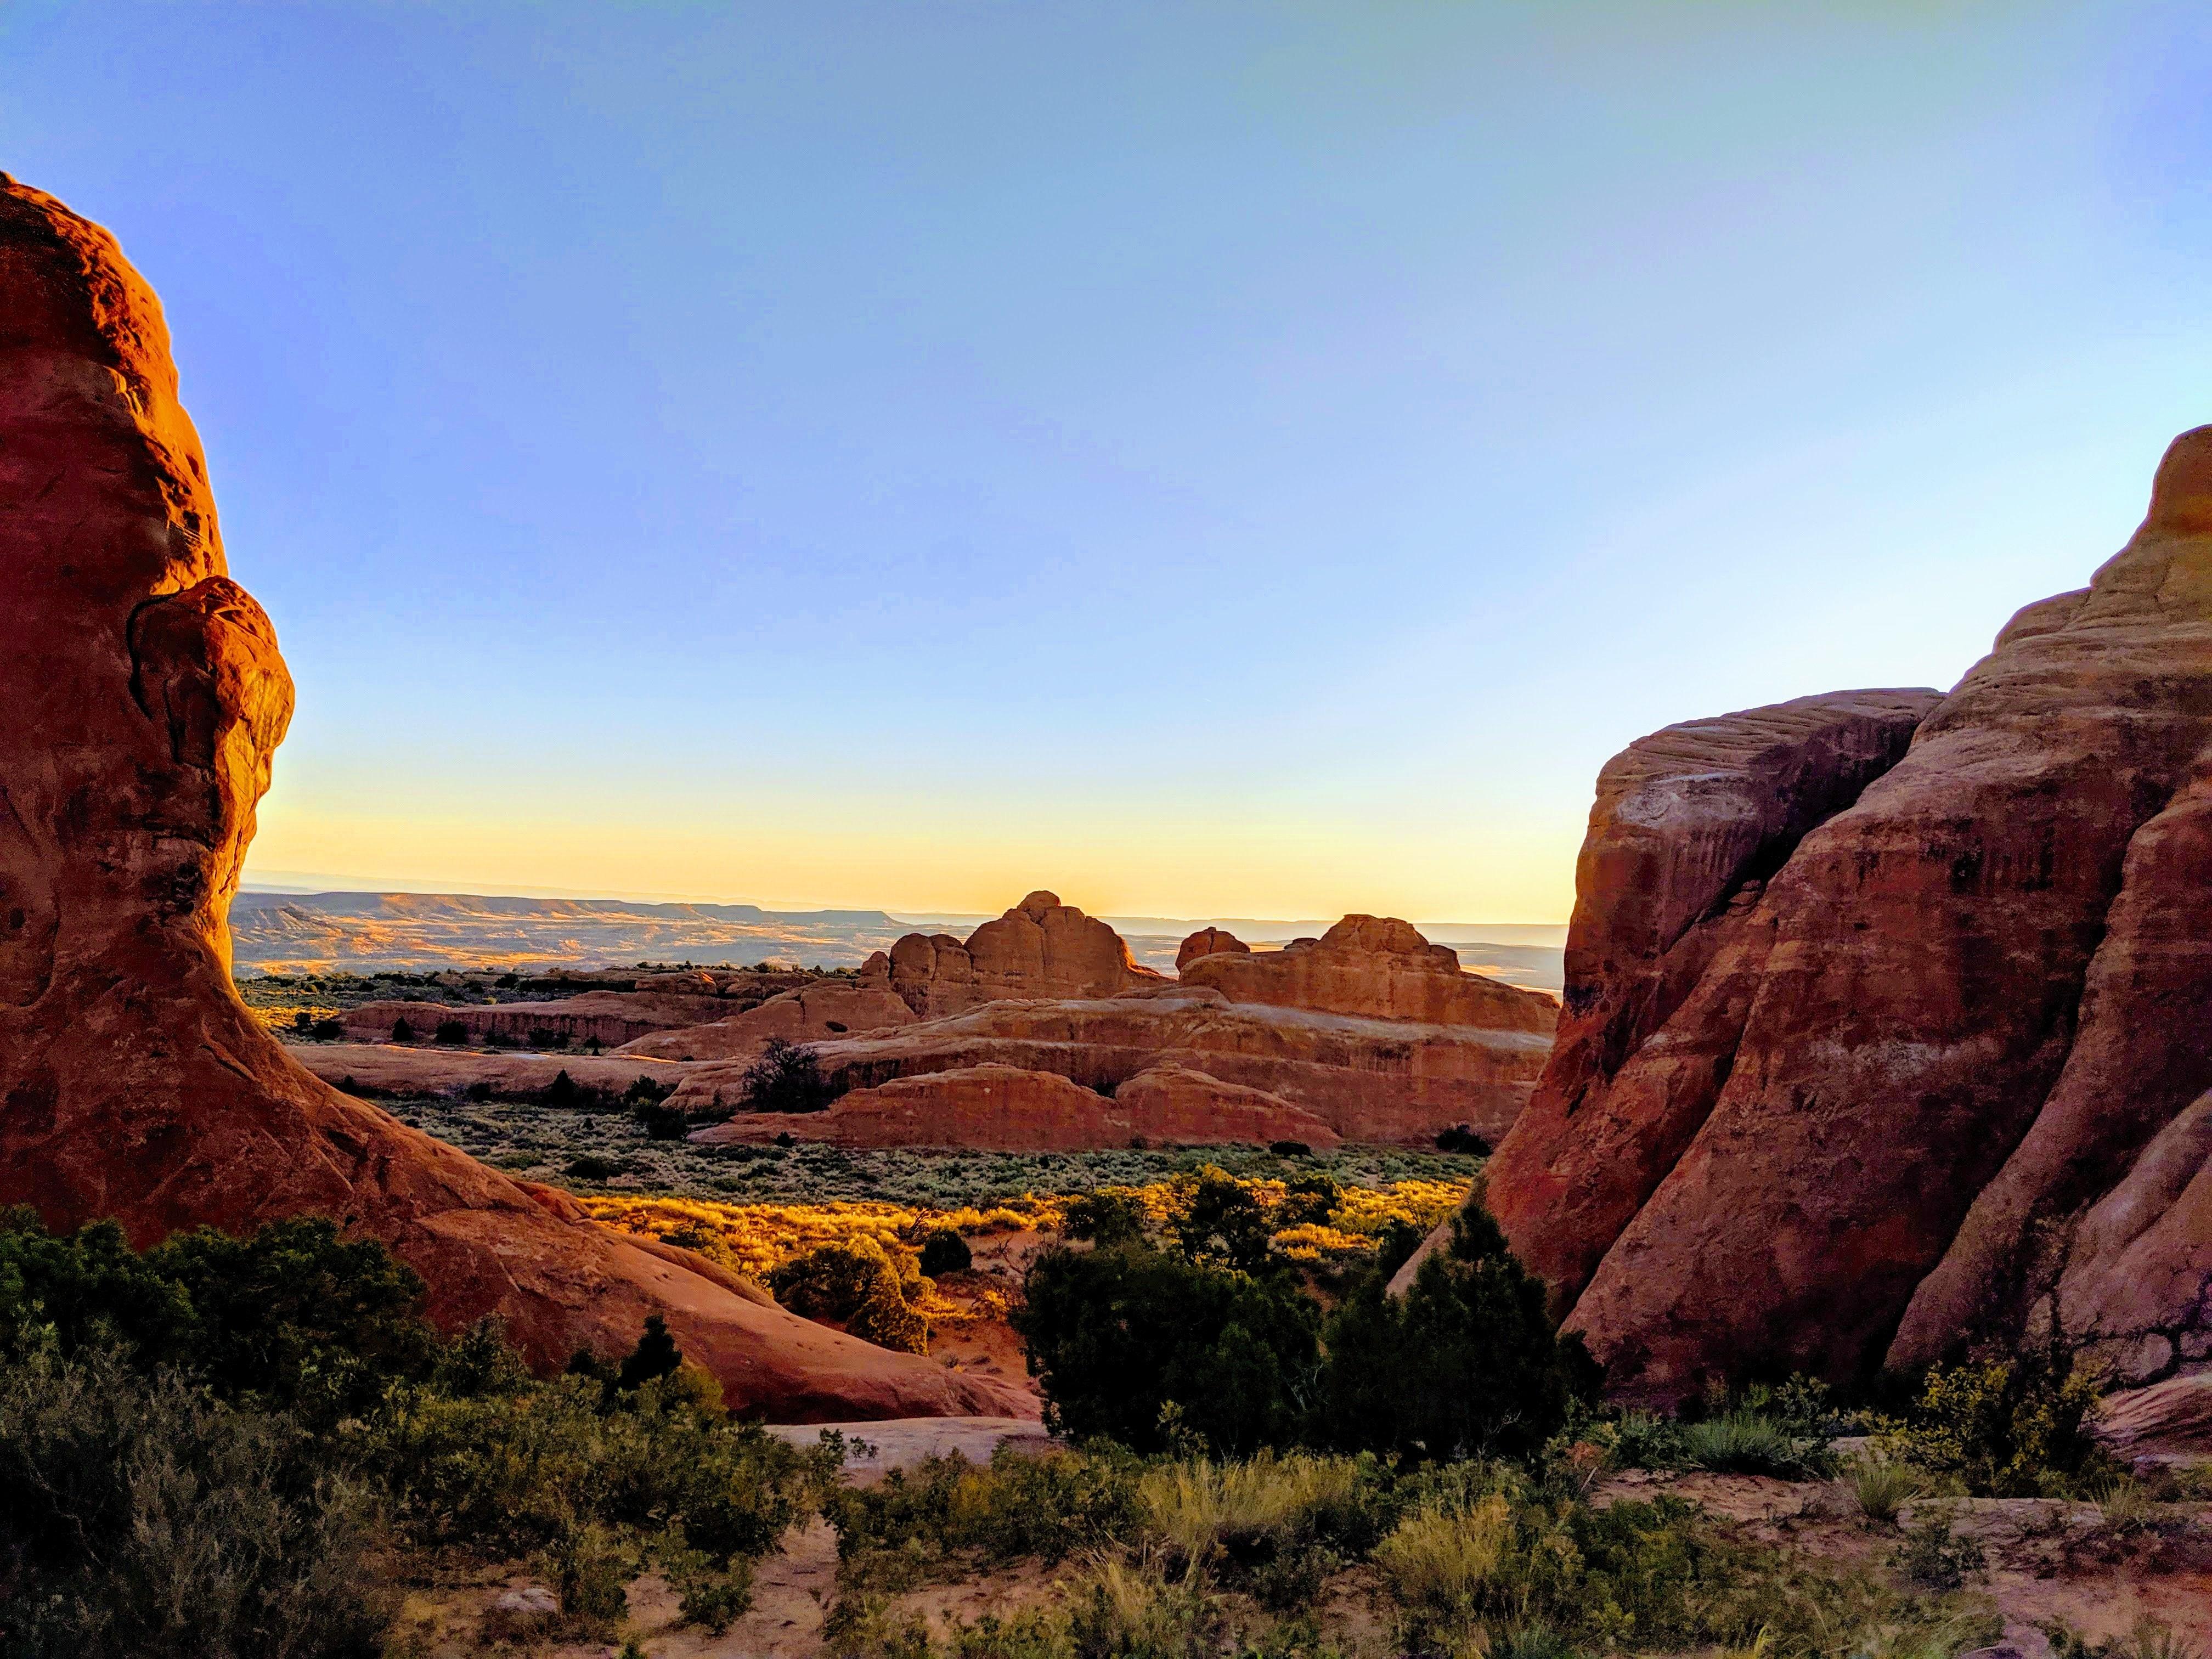 Hiking Moab Parks - The Trek